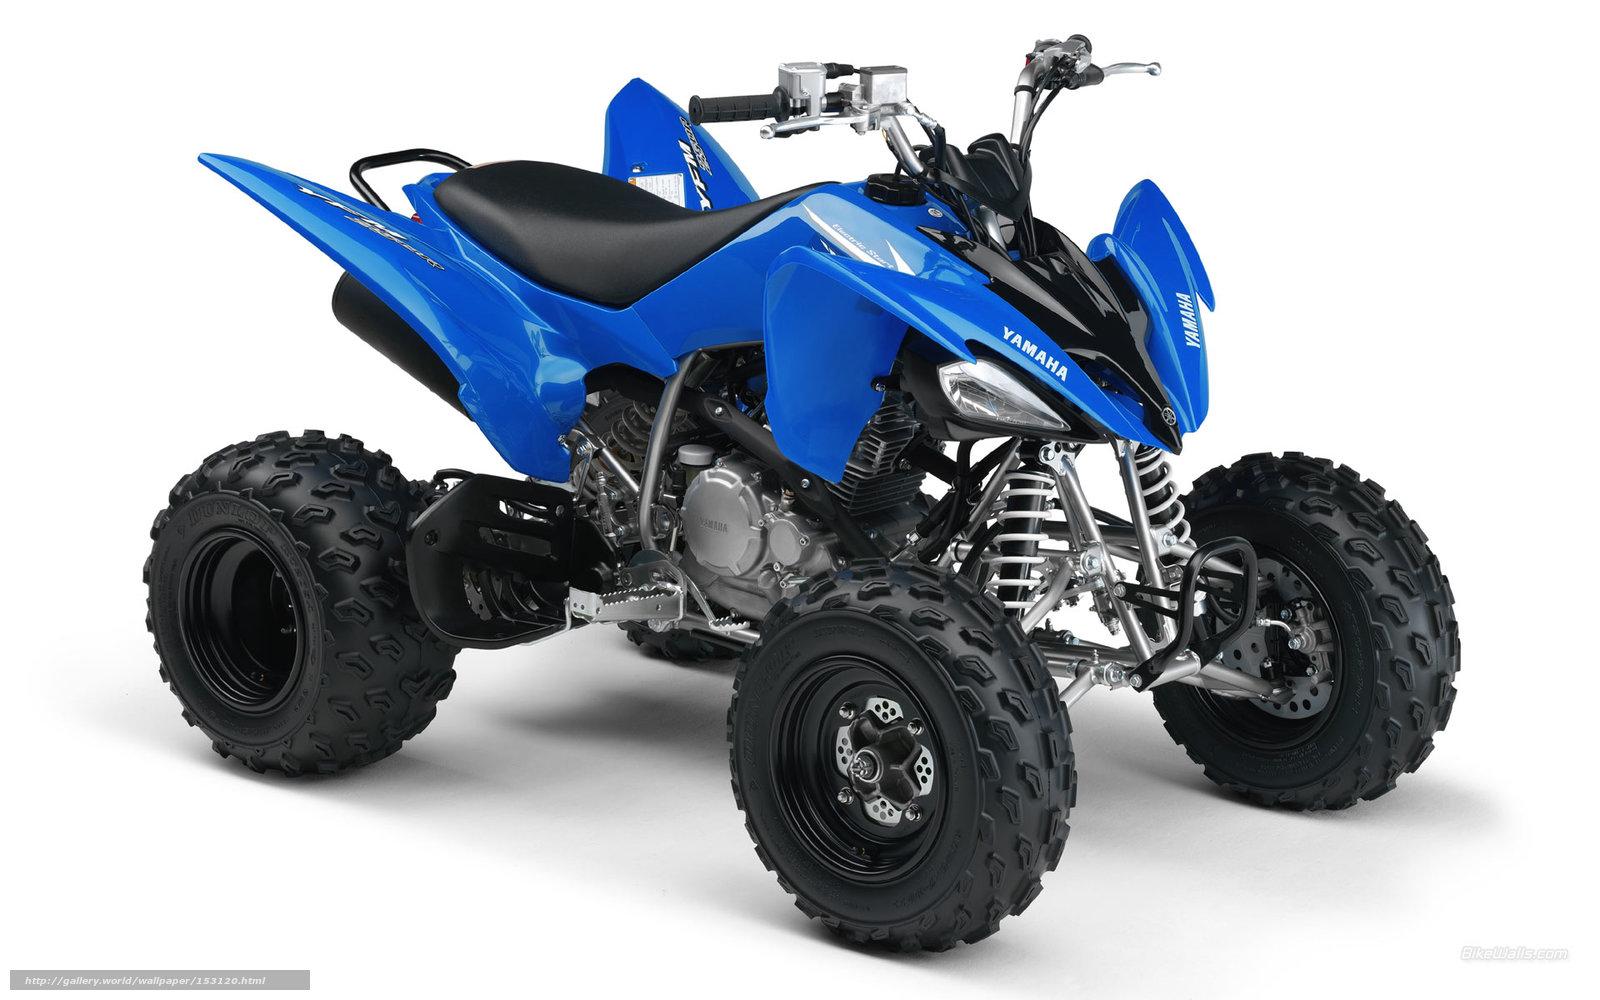 купить квадроцикл раптор 250 бу Инженерная служба р-на